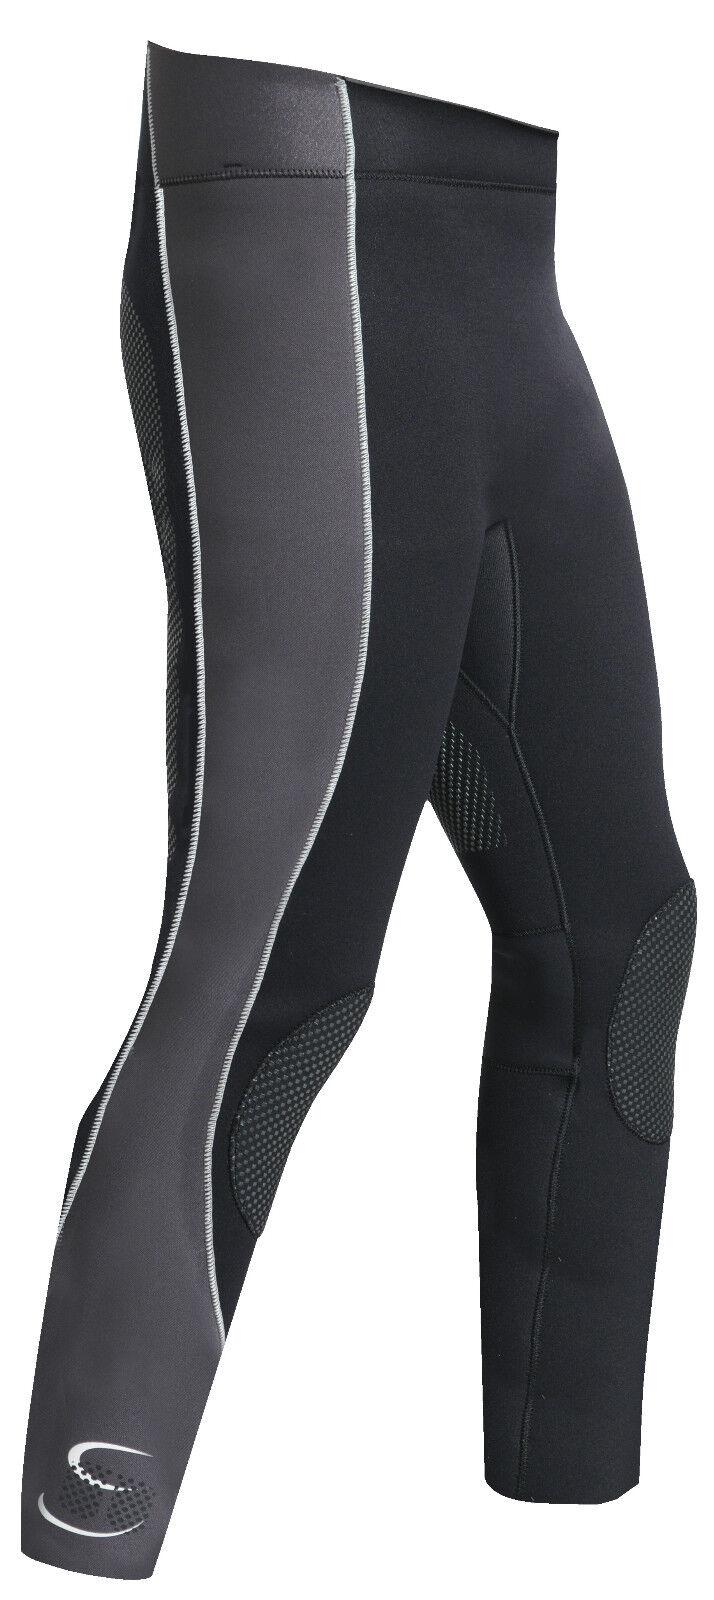 Nookie Strides Full Length -Neoprene Wetsuit Trousers Leg Kayak Canoe Sail SUP